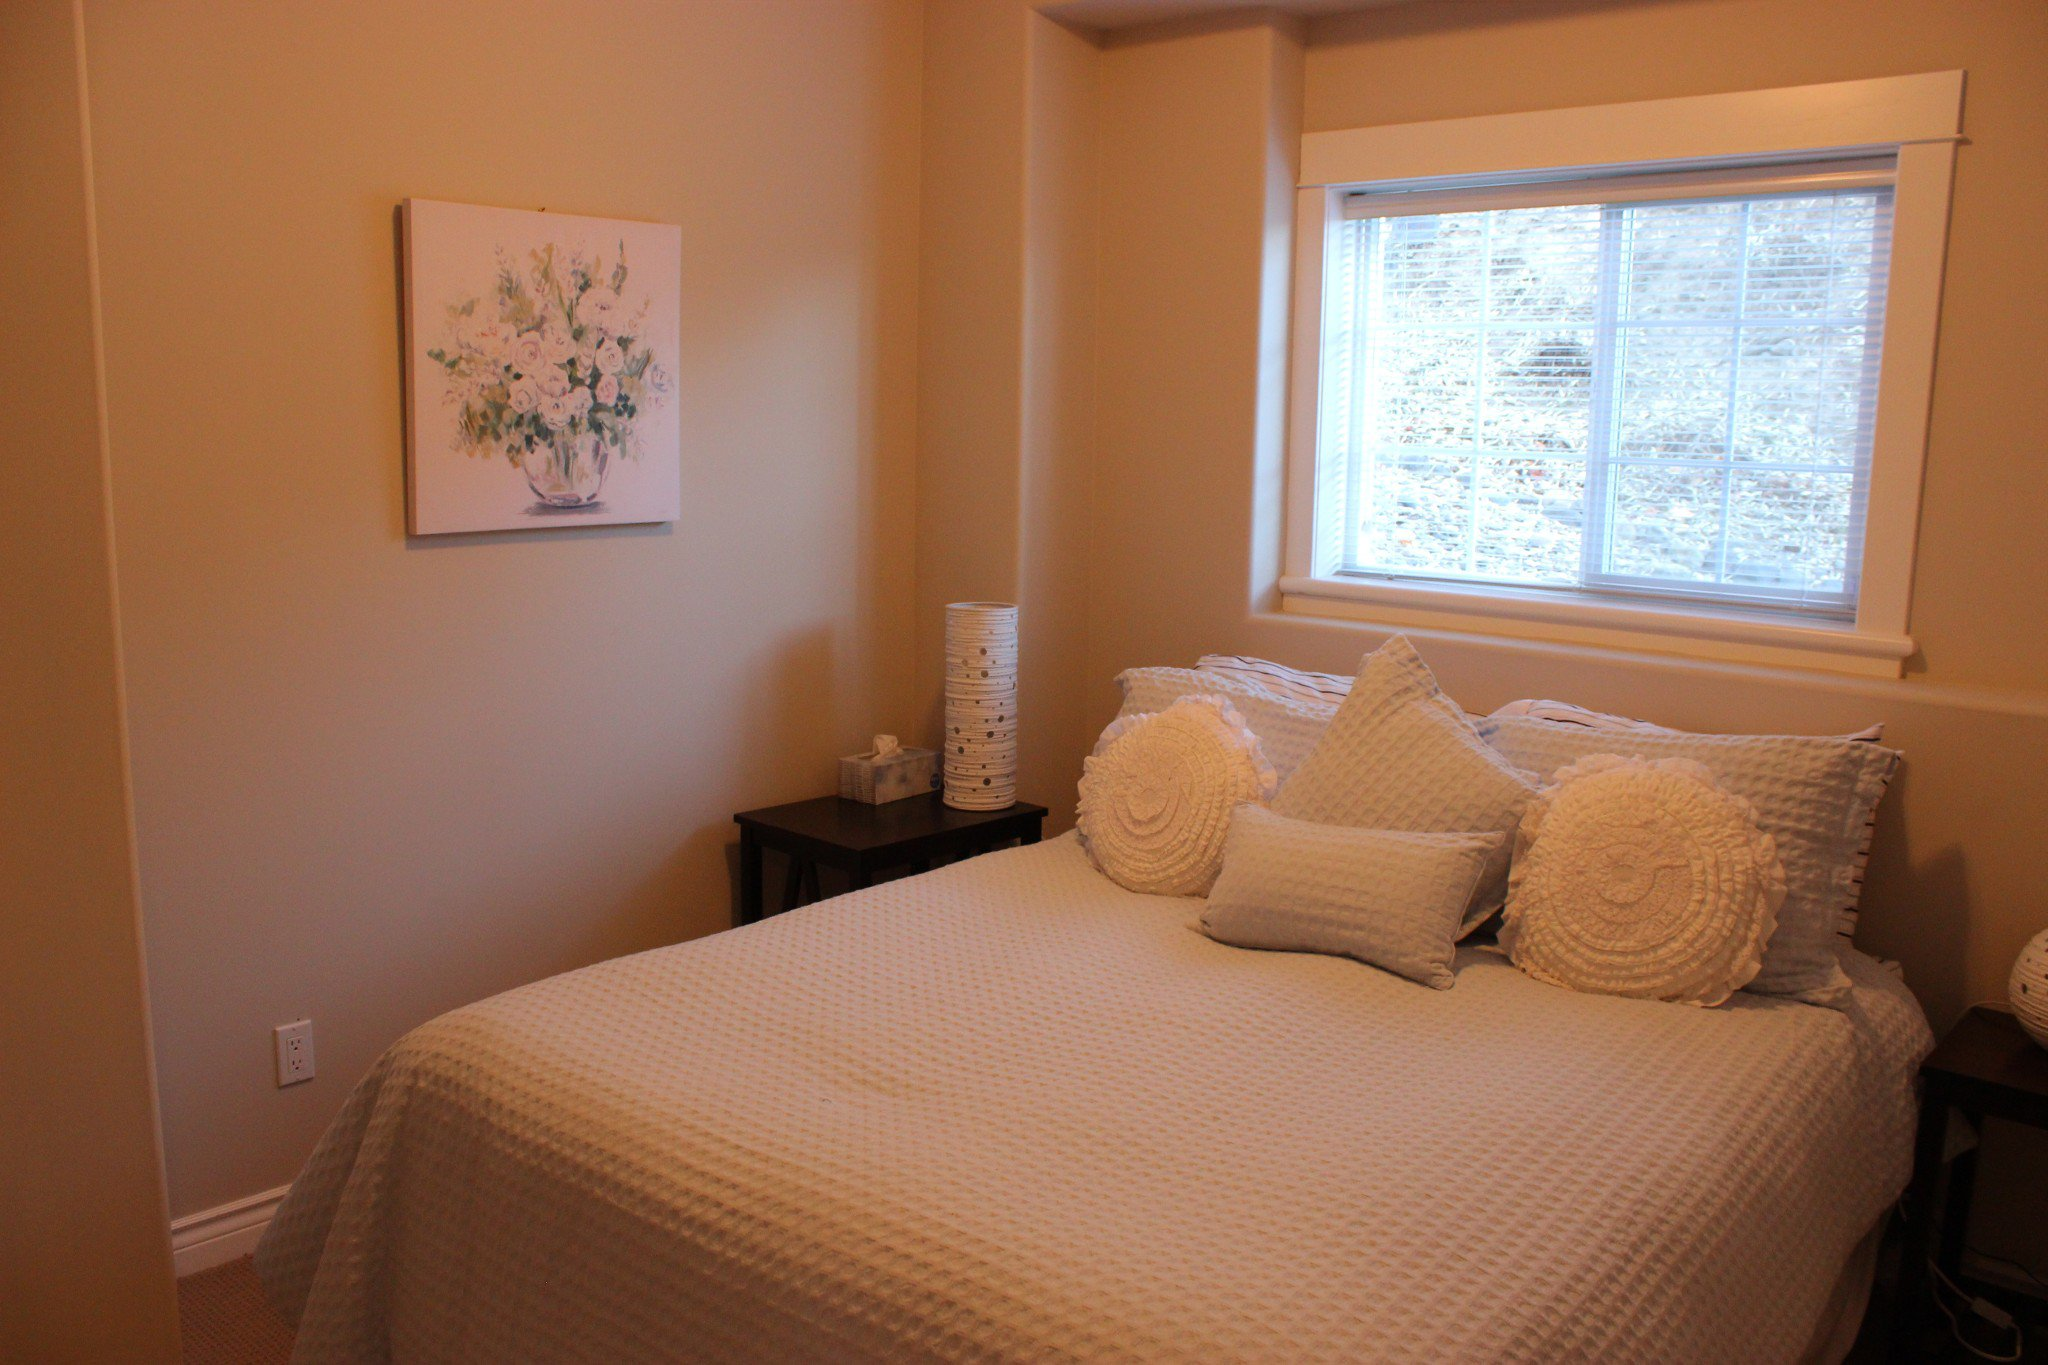 Photo 24: Photos: 101 875 Sahali Terrace in Kamloops: Lower Sahali Townhouse for sale : MLS®# 154556